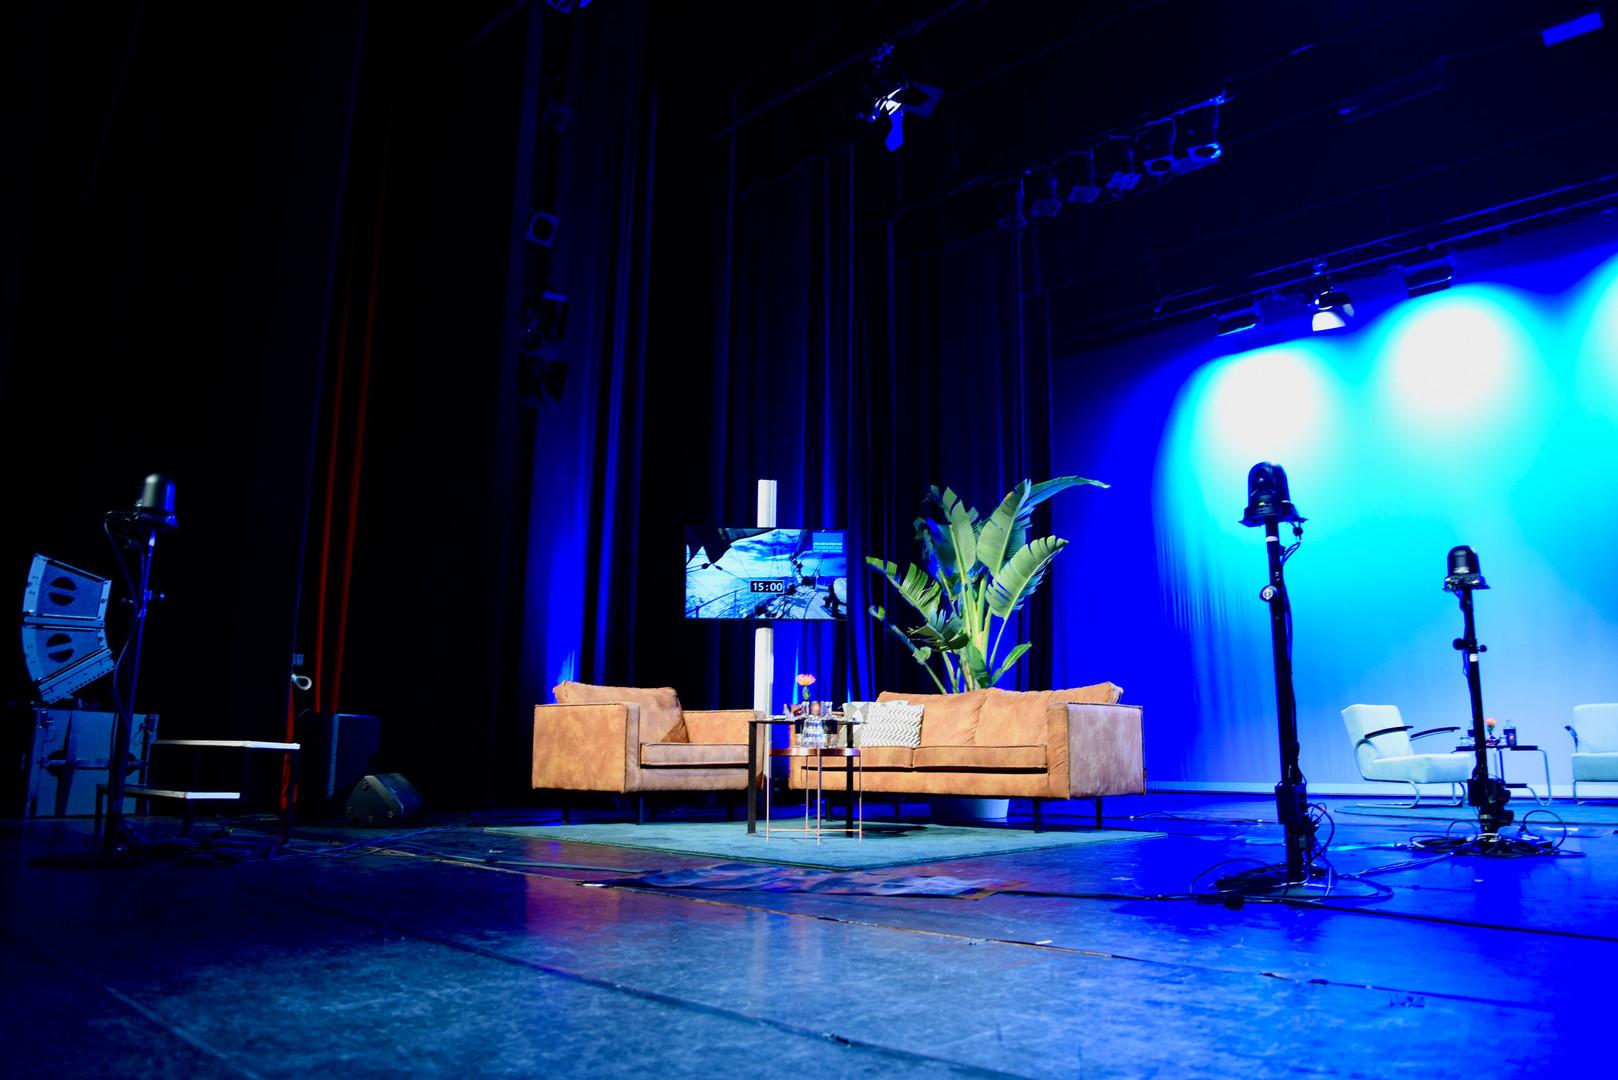 Livestream Studio Hilversum